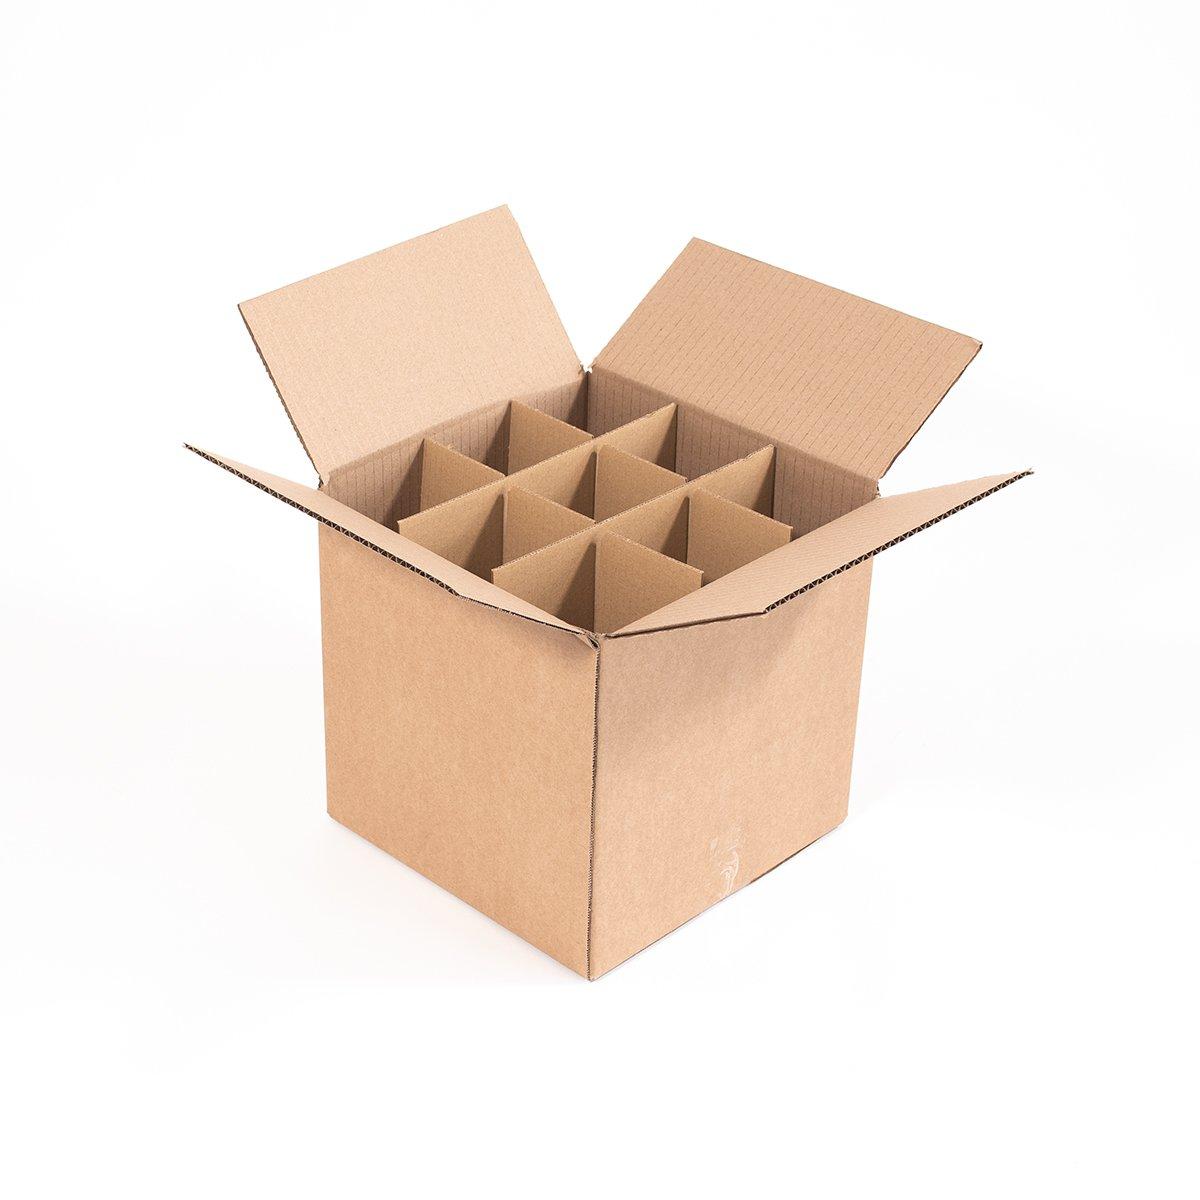 carton sp cial fl tes champagne 25x25x25cm. Black Bedroom Furniture Sets. Home Design Ideas